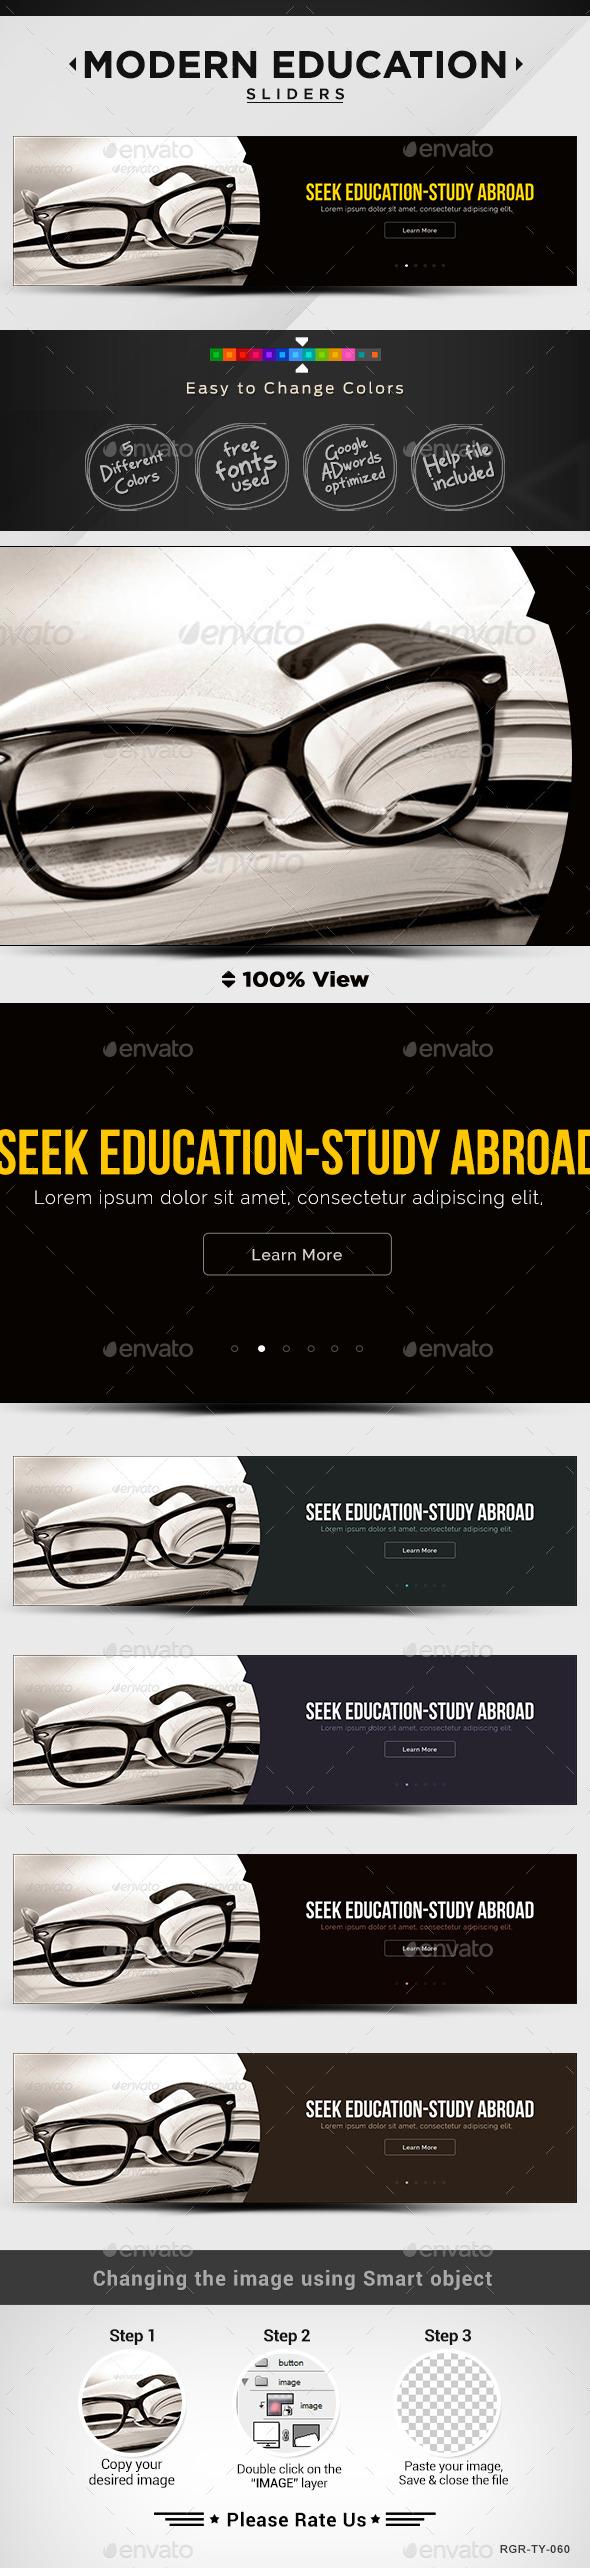 GraphicRiver Education & College Sliders 8835559